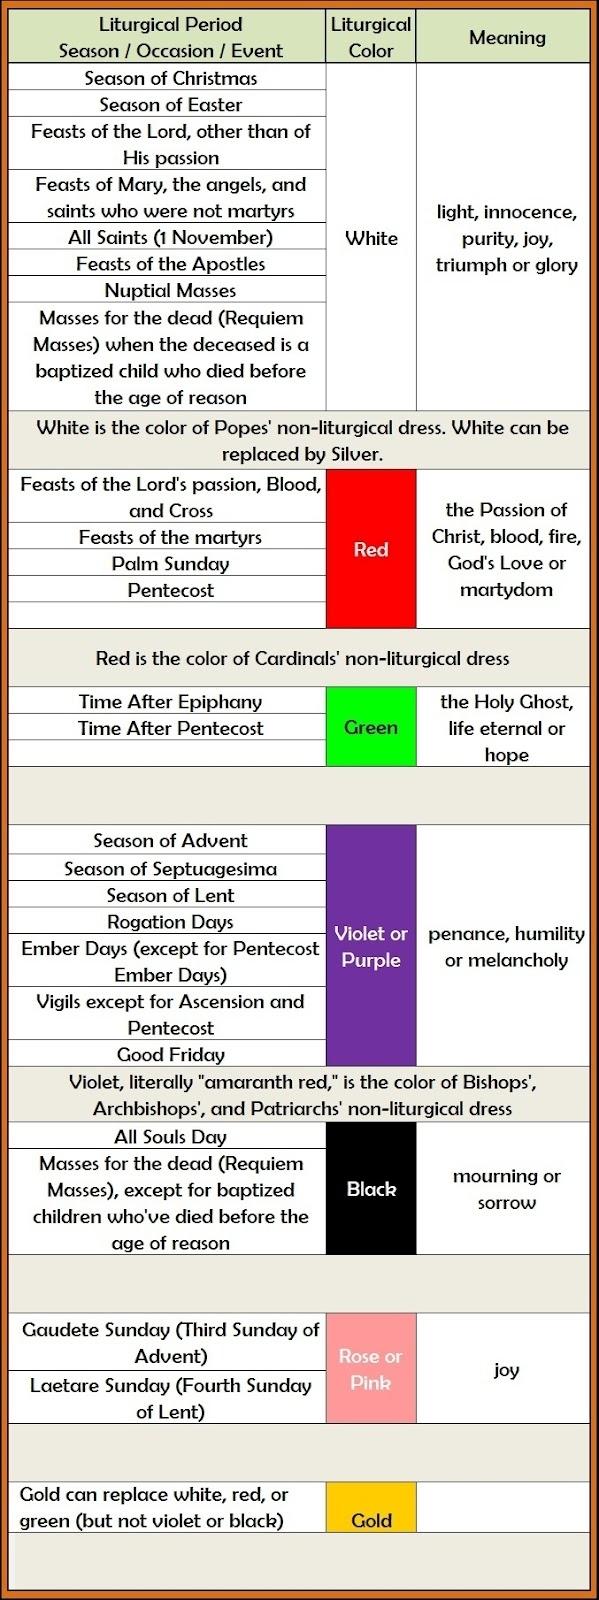 St. Luke Catholic Church: Liturgical Calendar